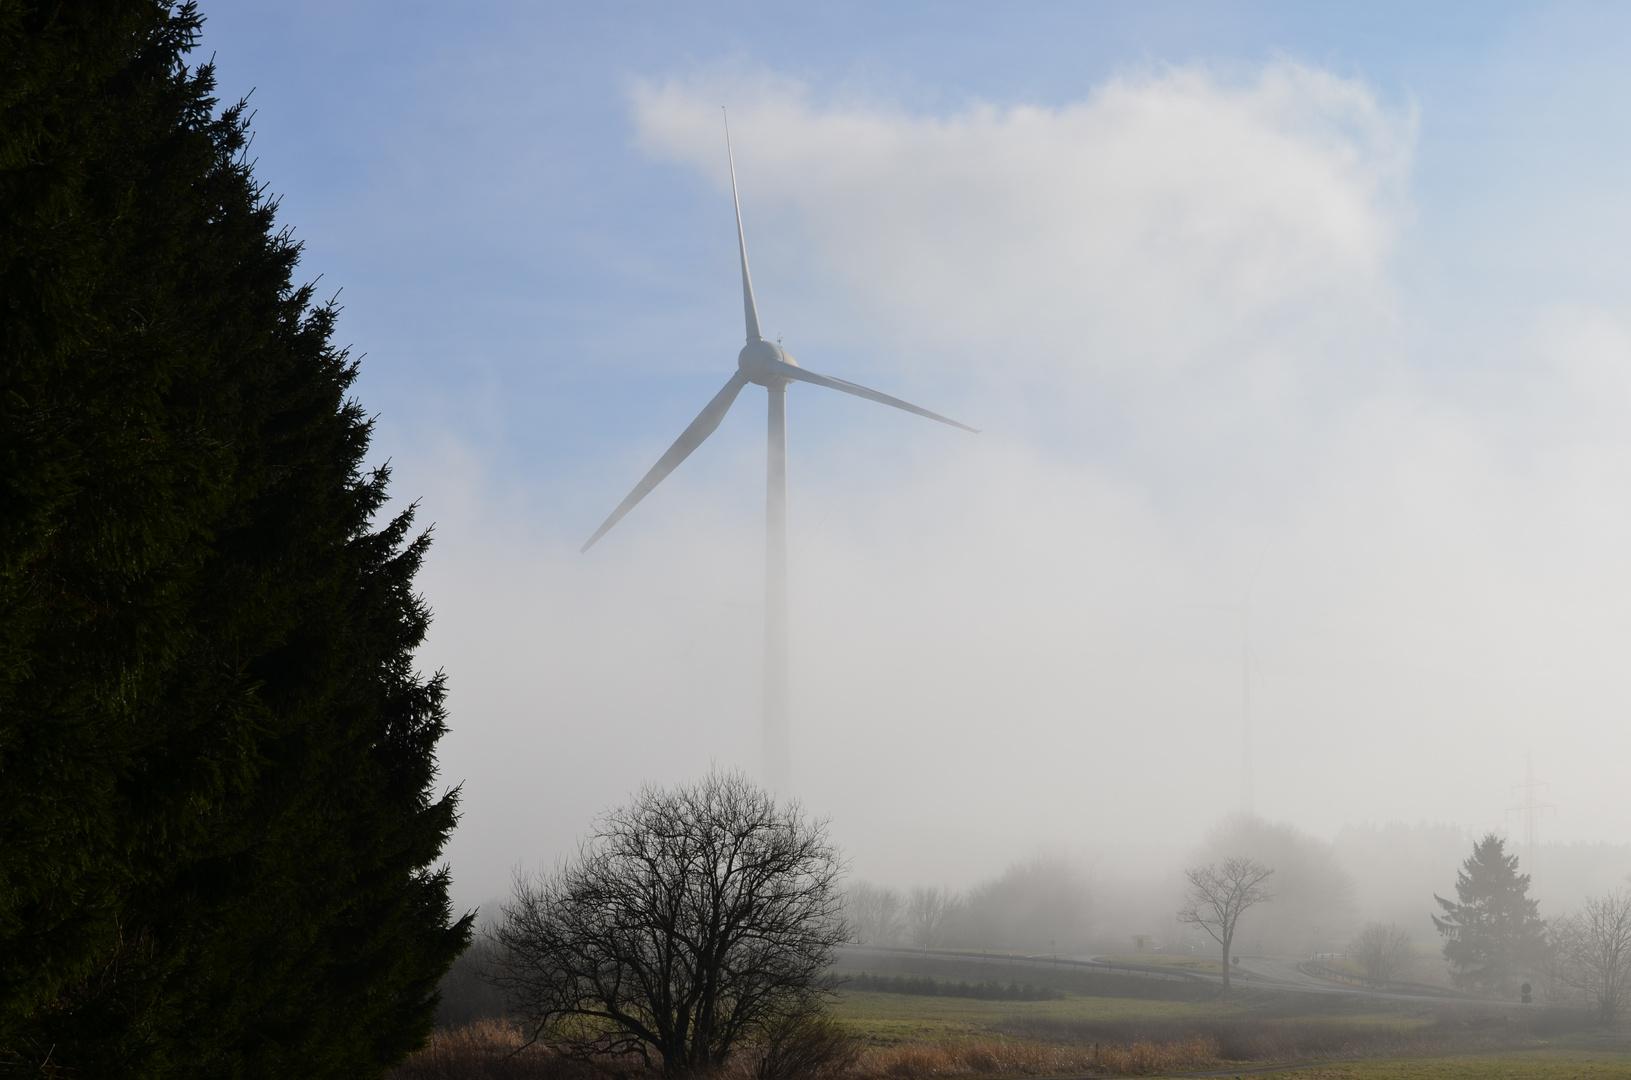 Nebel am Nachmittag